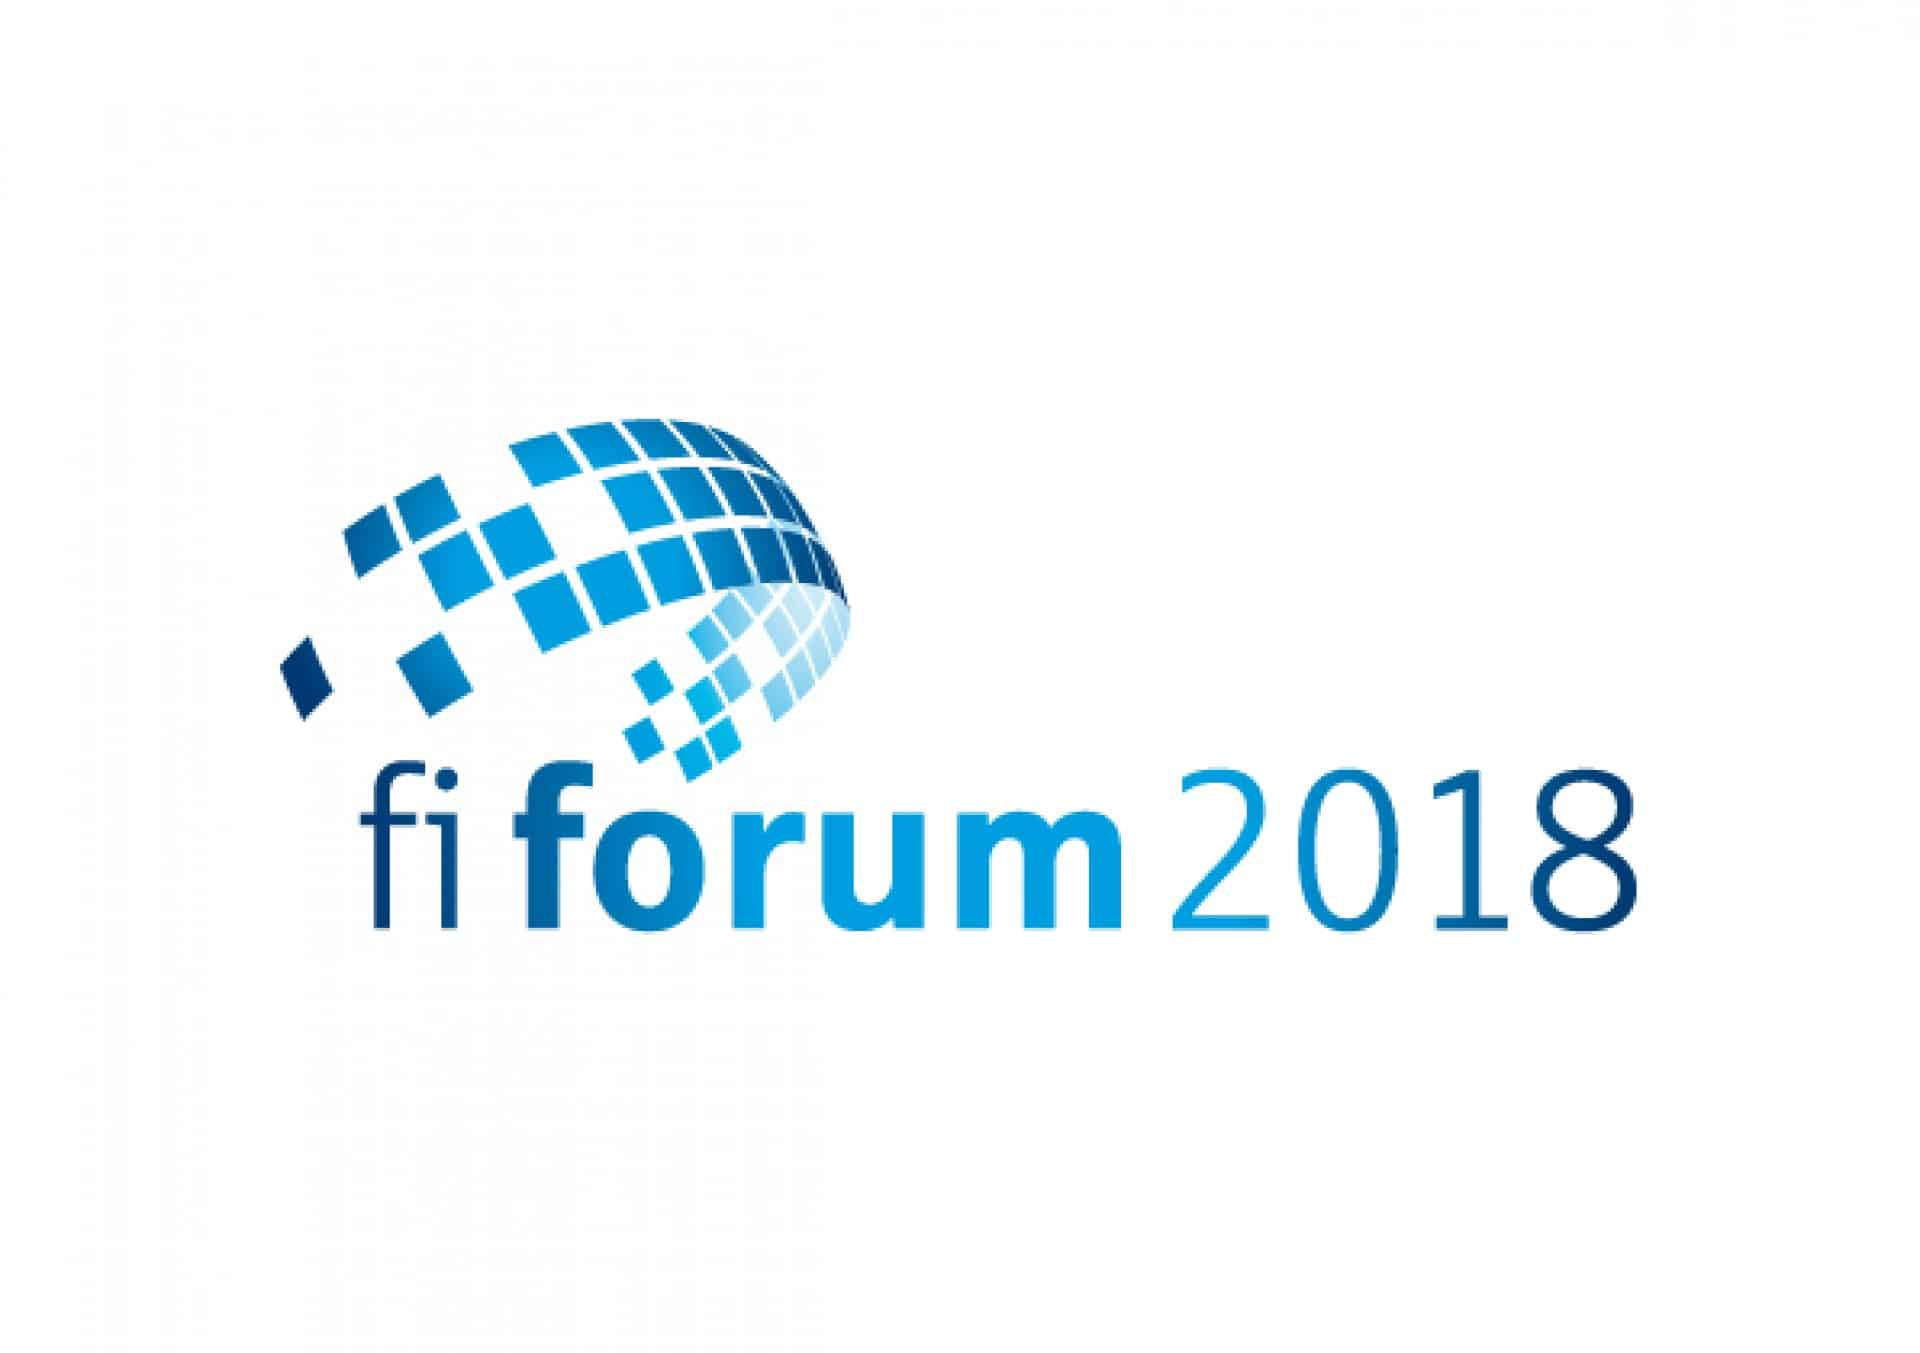 FI-Forum 2018